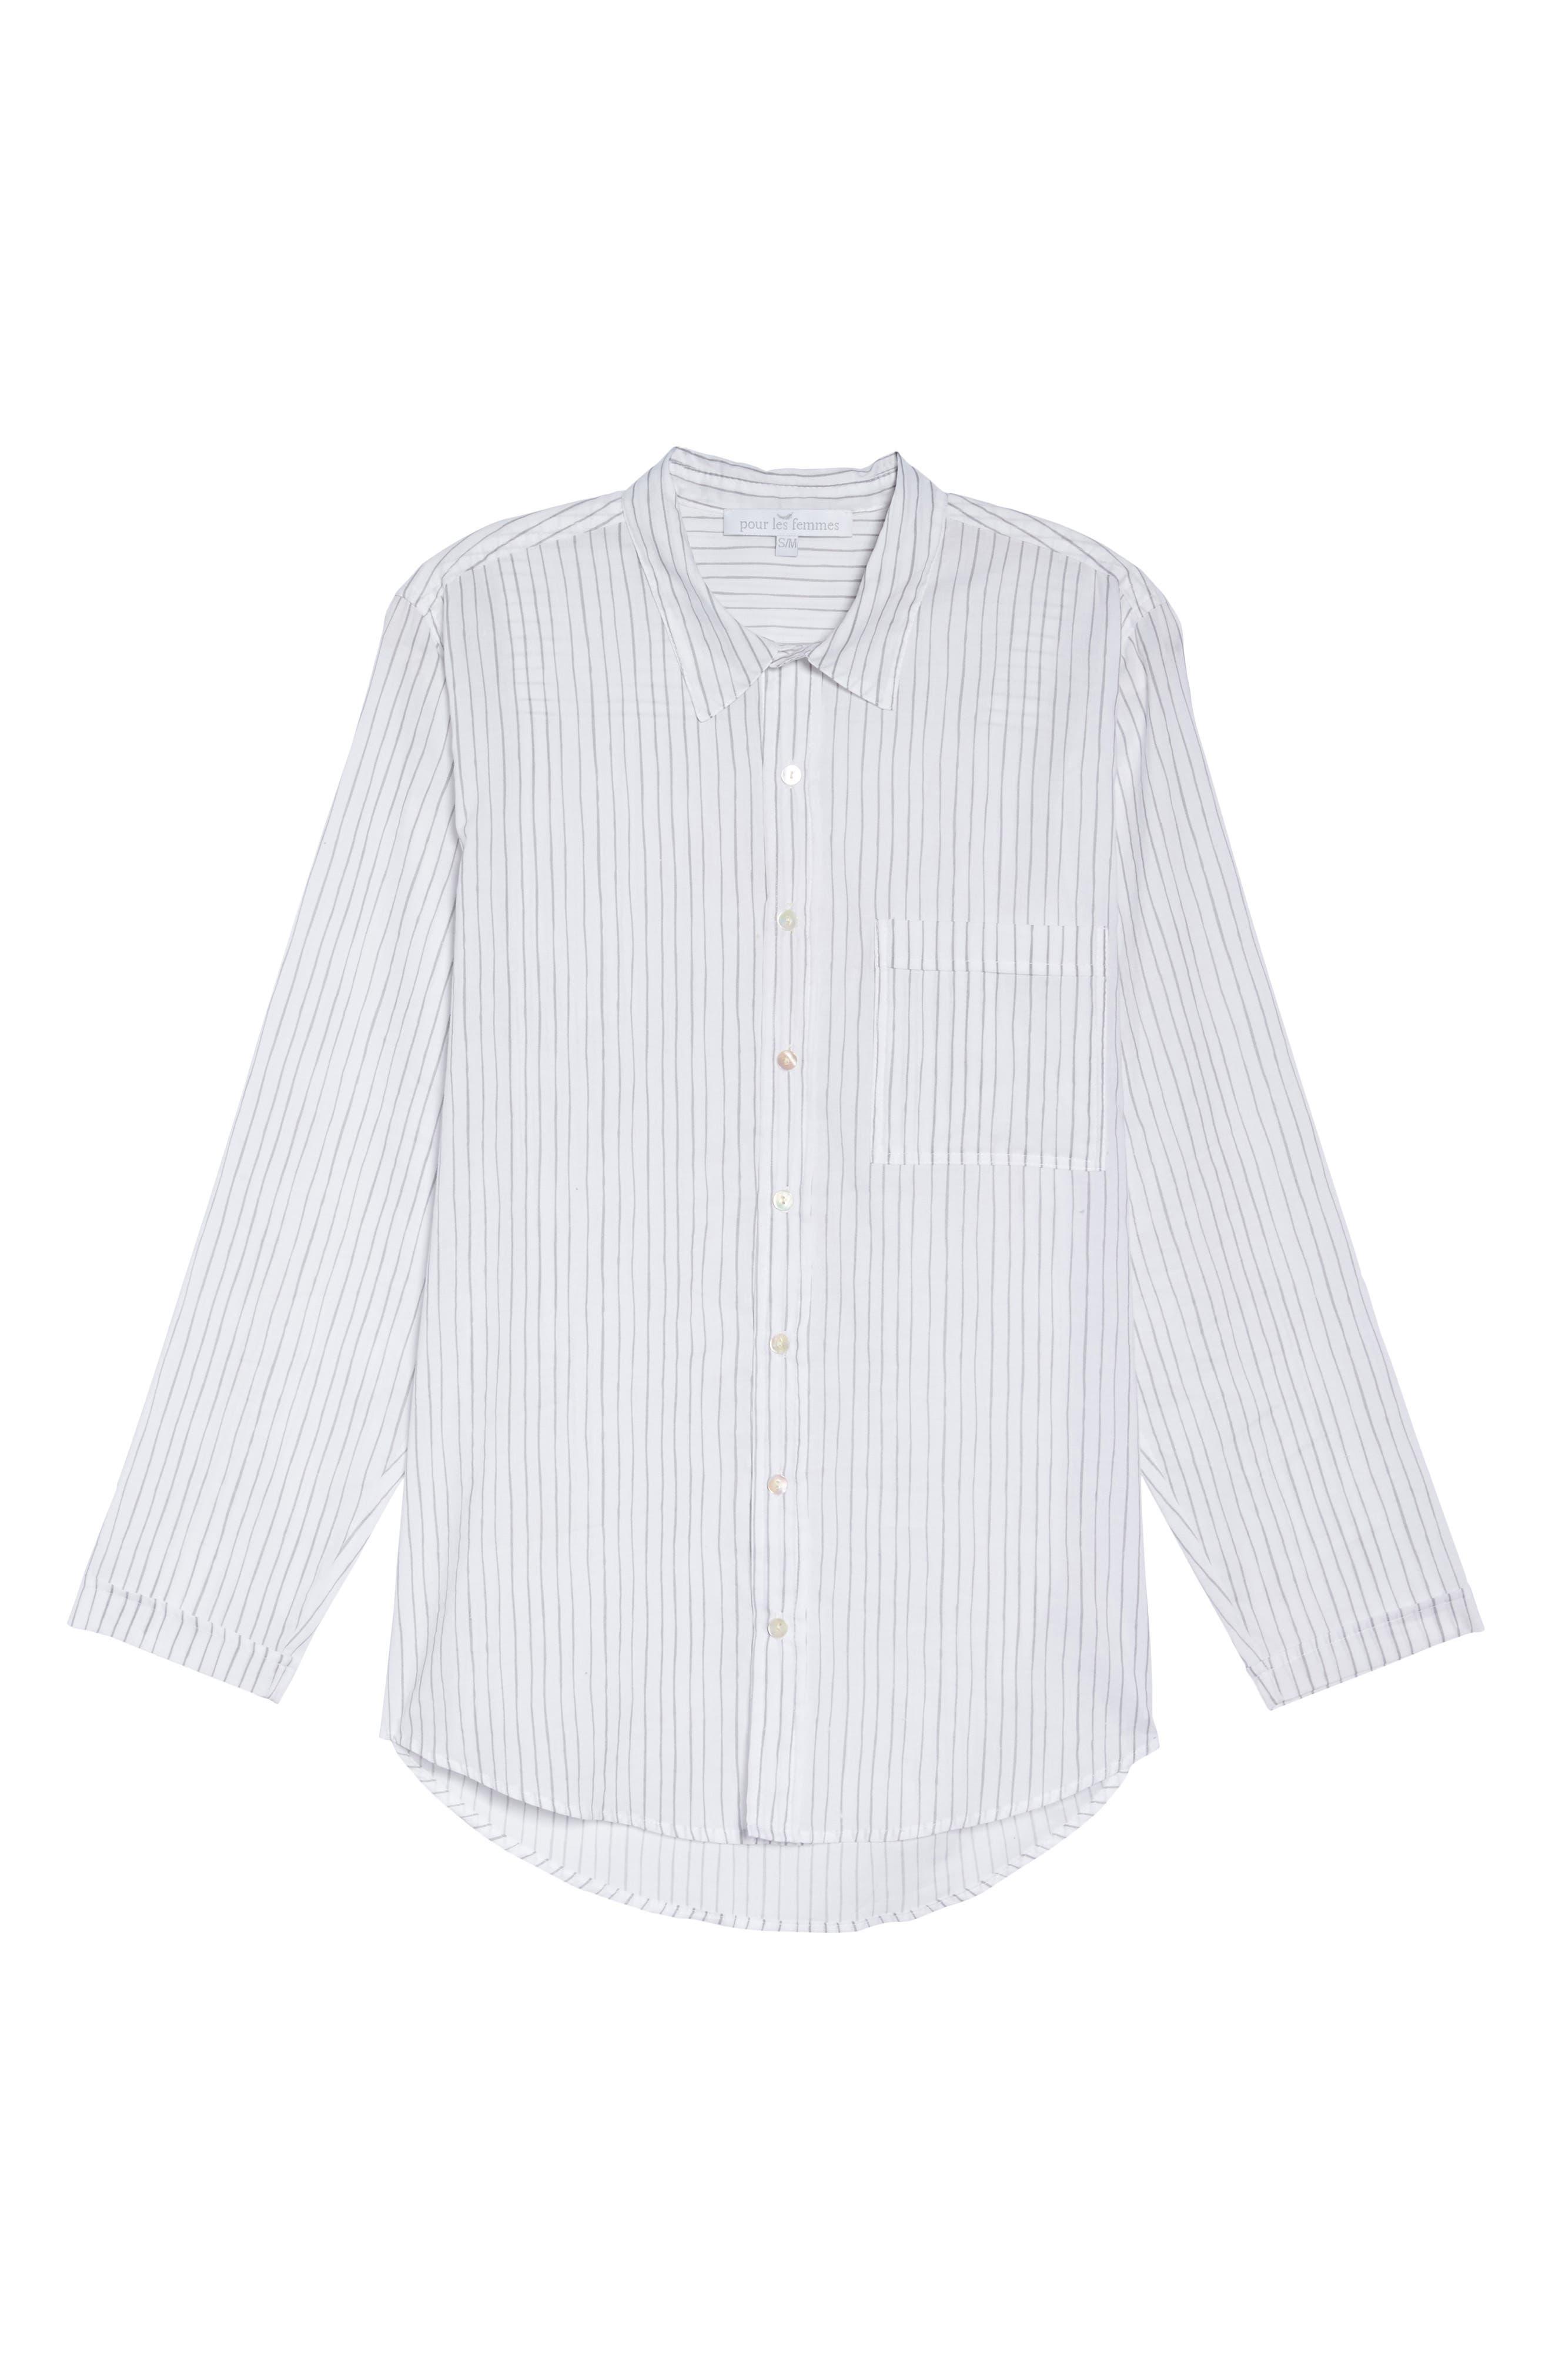 Pinstripe Boyfriend Sleep Shirt,                             Alternate thumbnail 6, color,                             020